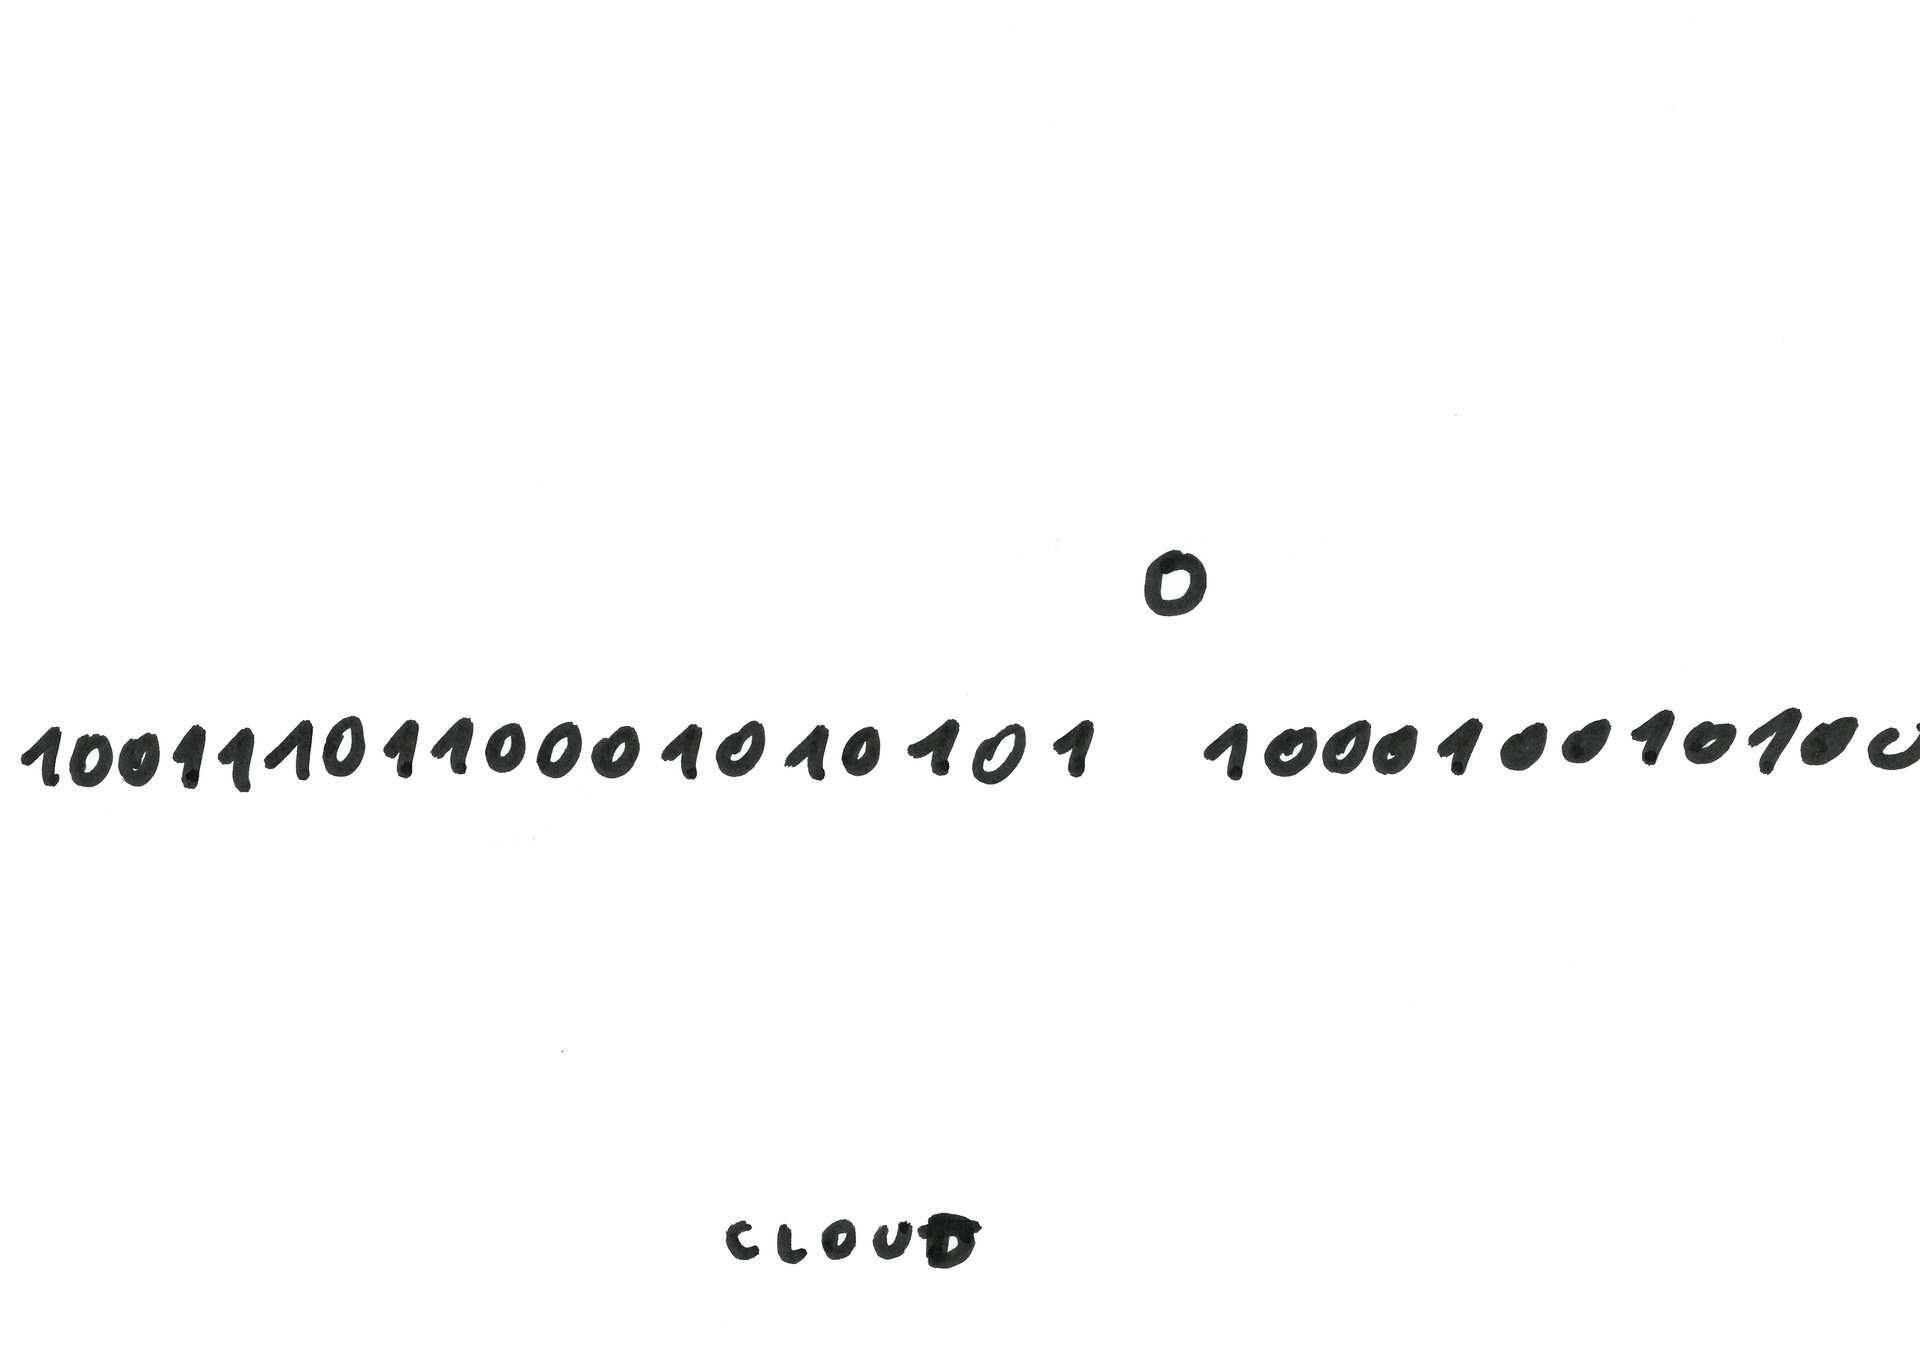 Dan Perjovschi, Come Cloud With Me (01/20), 2012